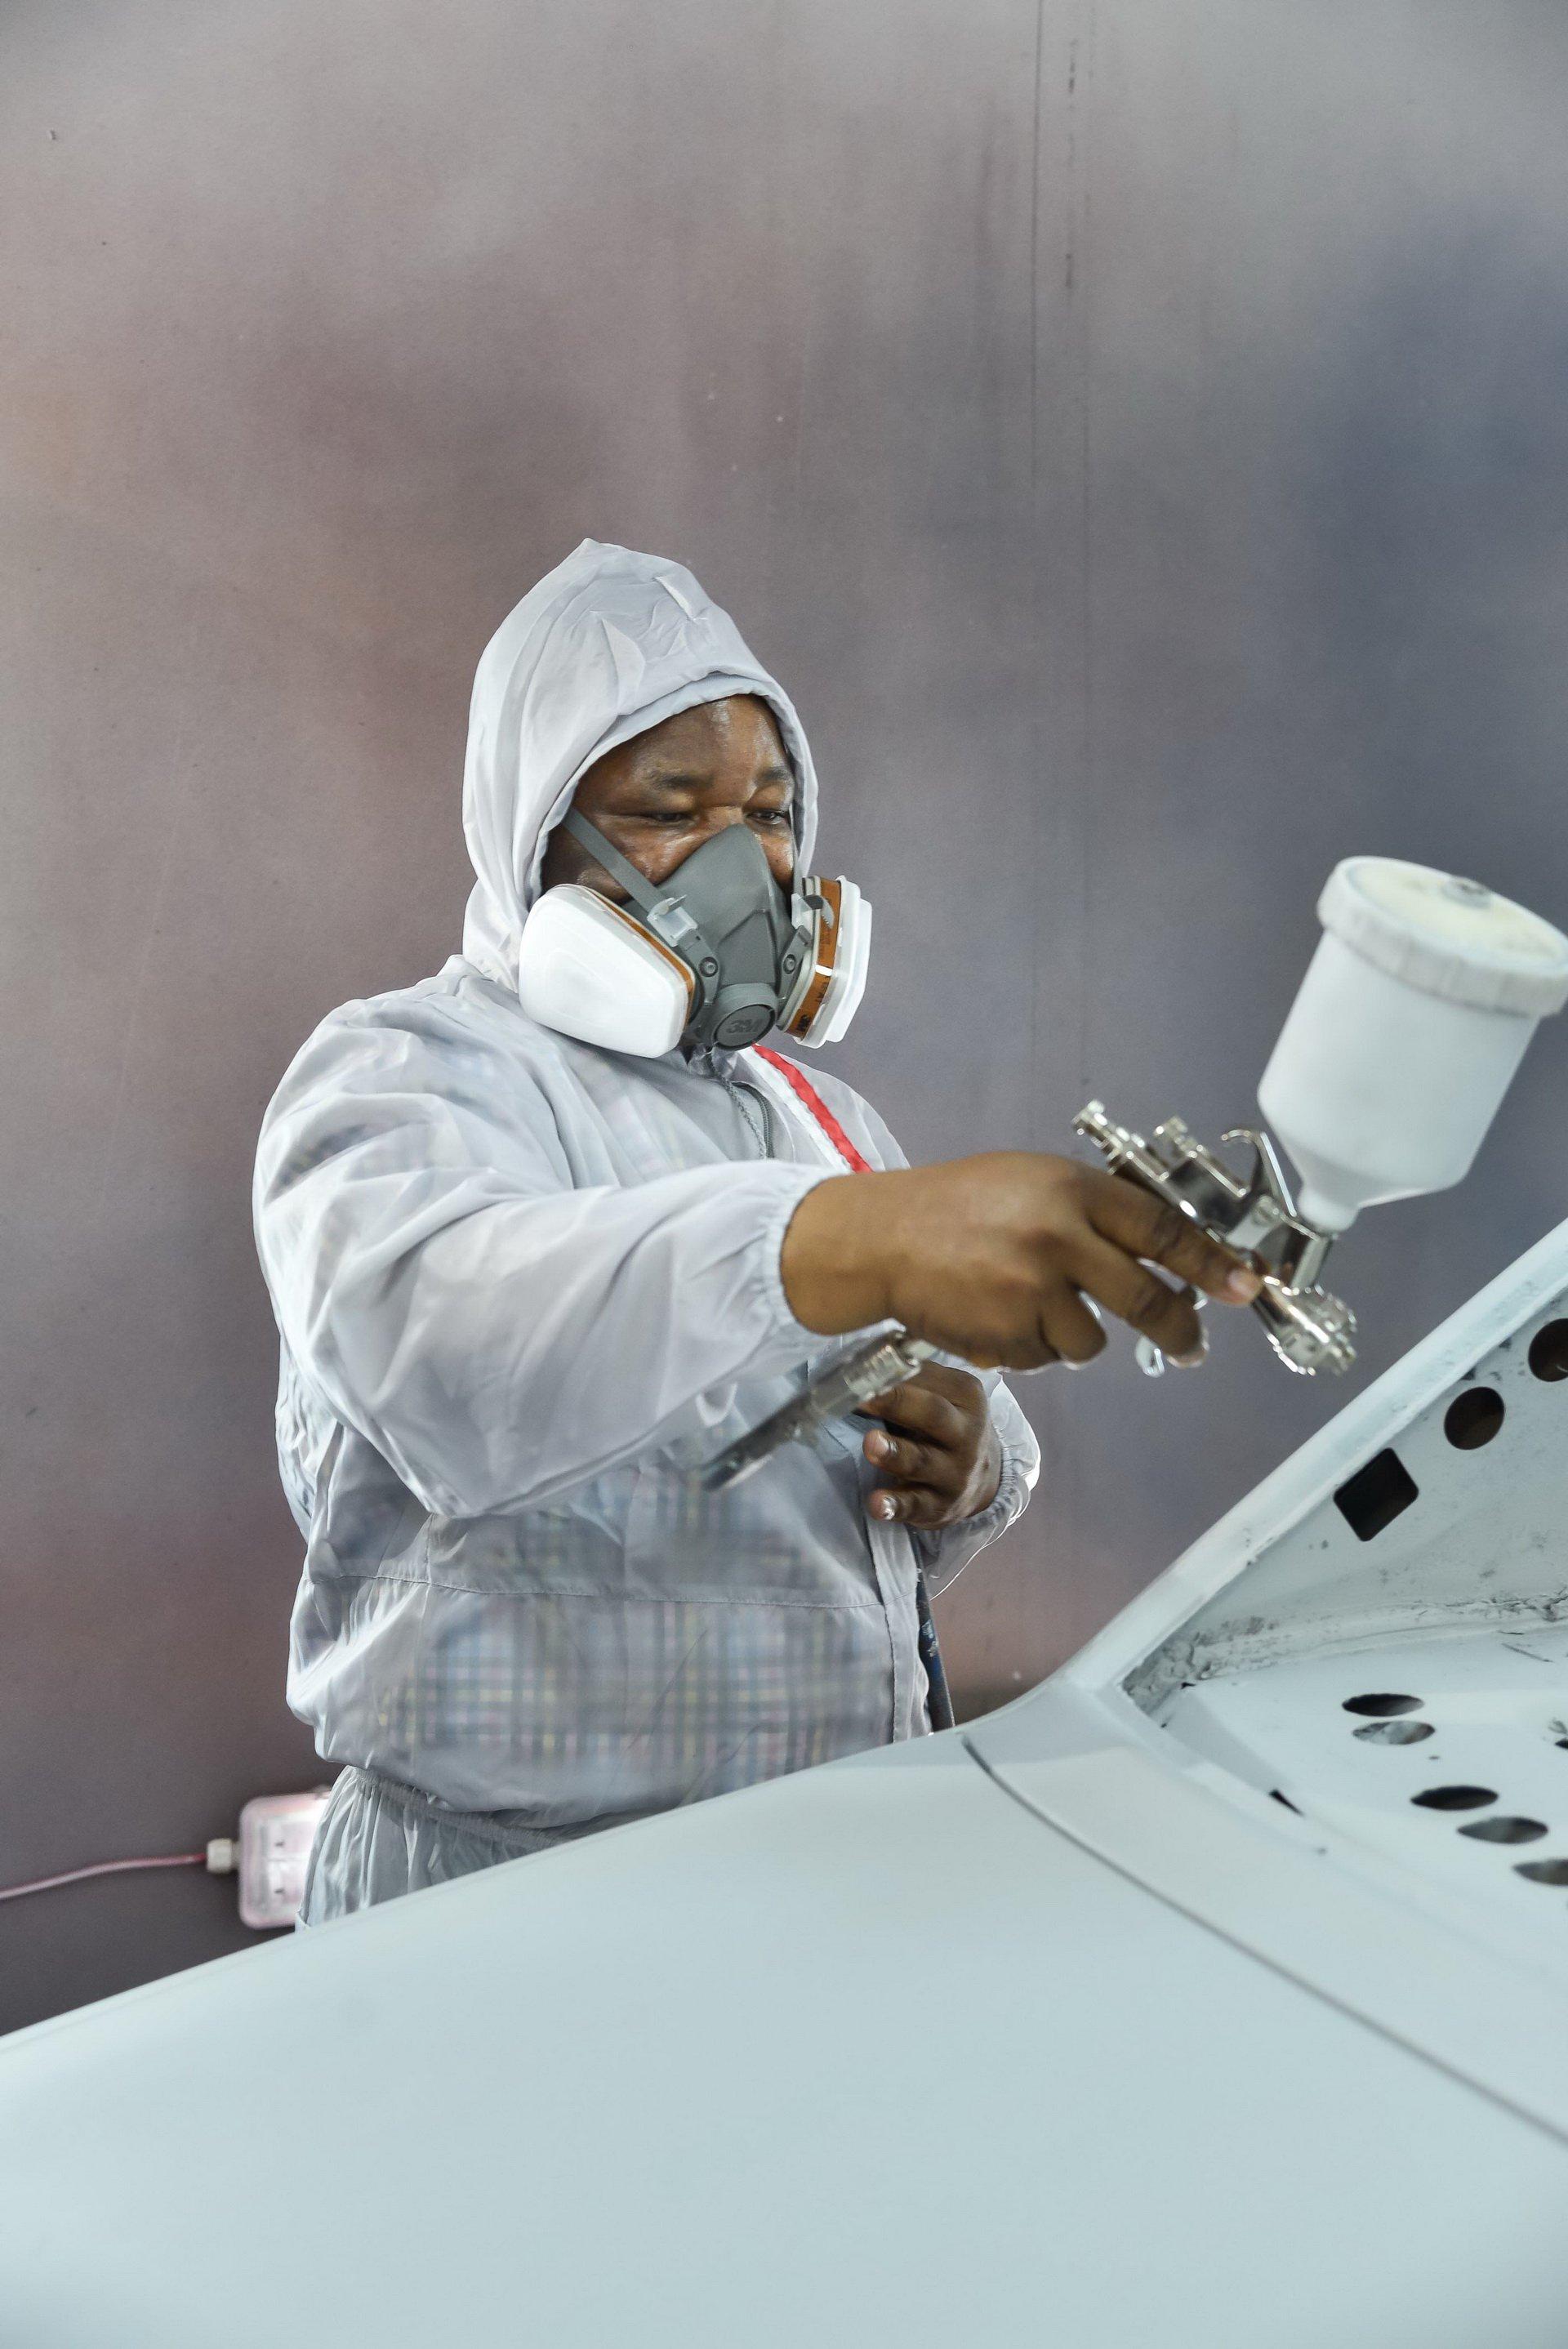 BMW-530-MLE-Restoration-process-113